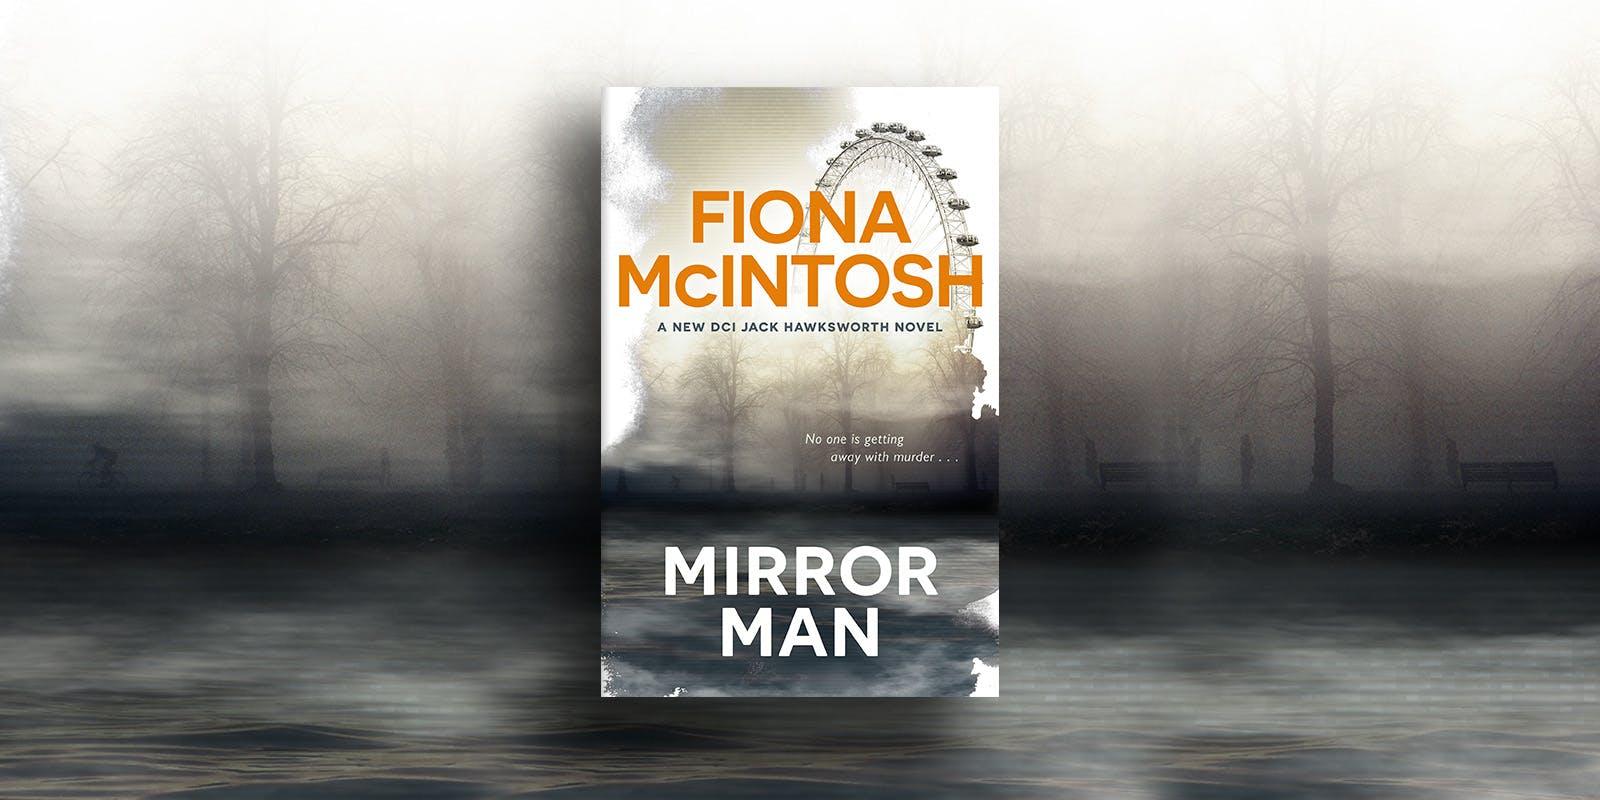 Fiona McIntosh on DCI Jack Hawksworth